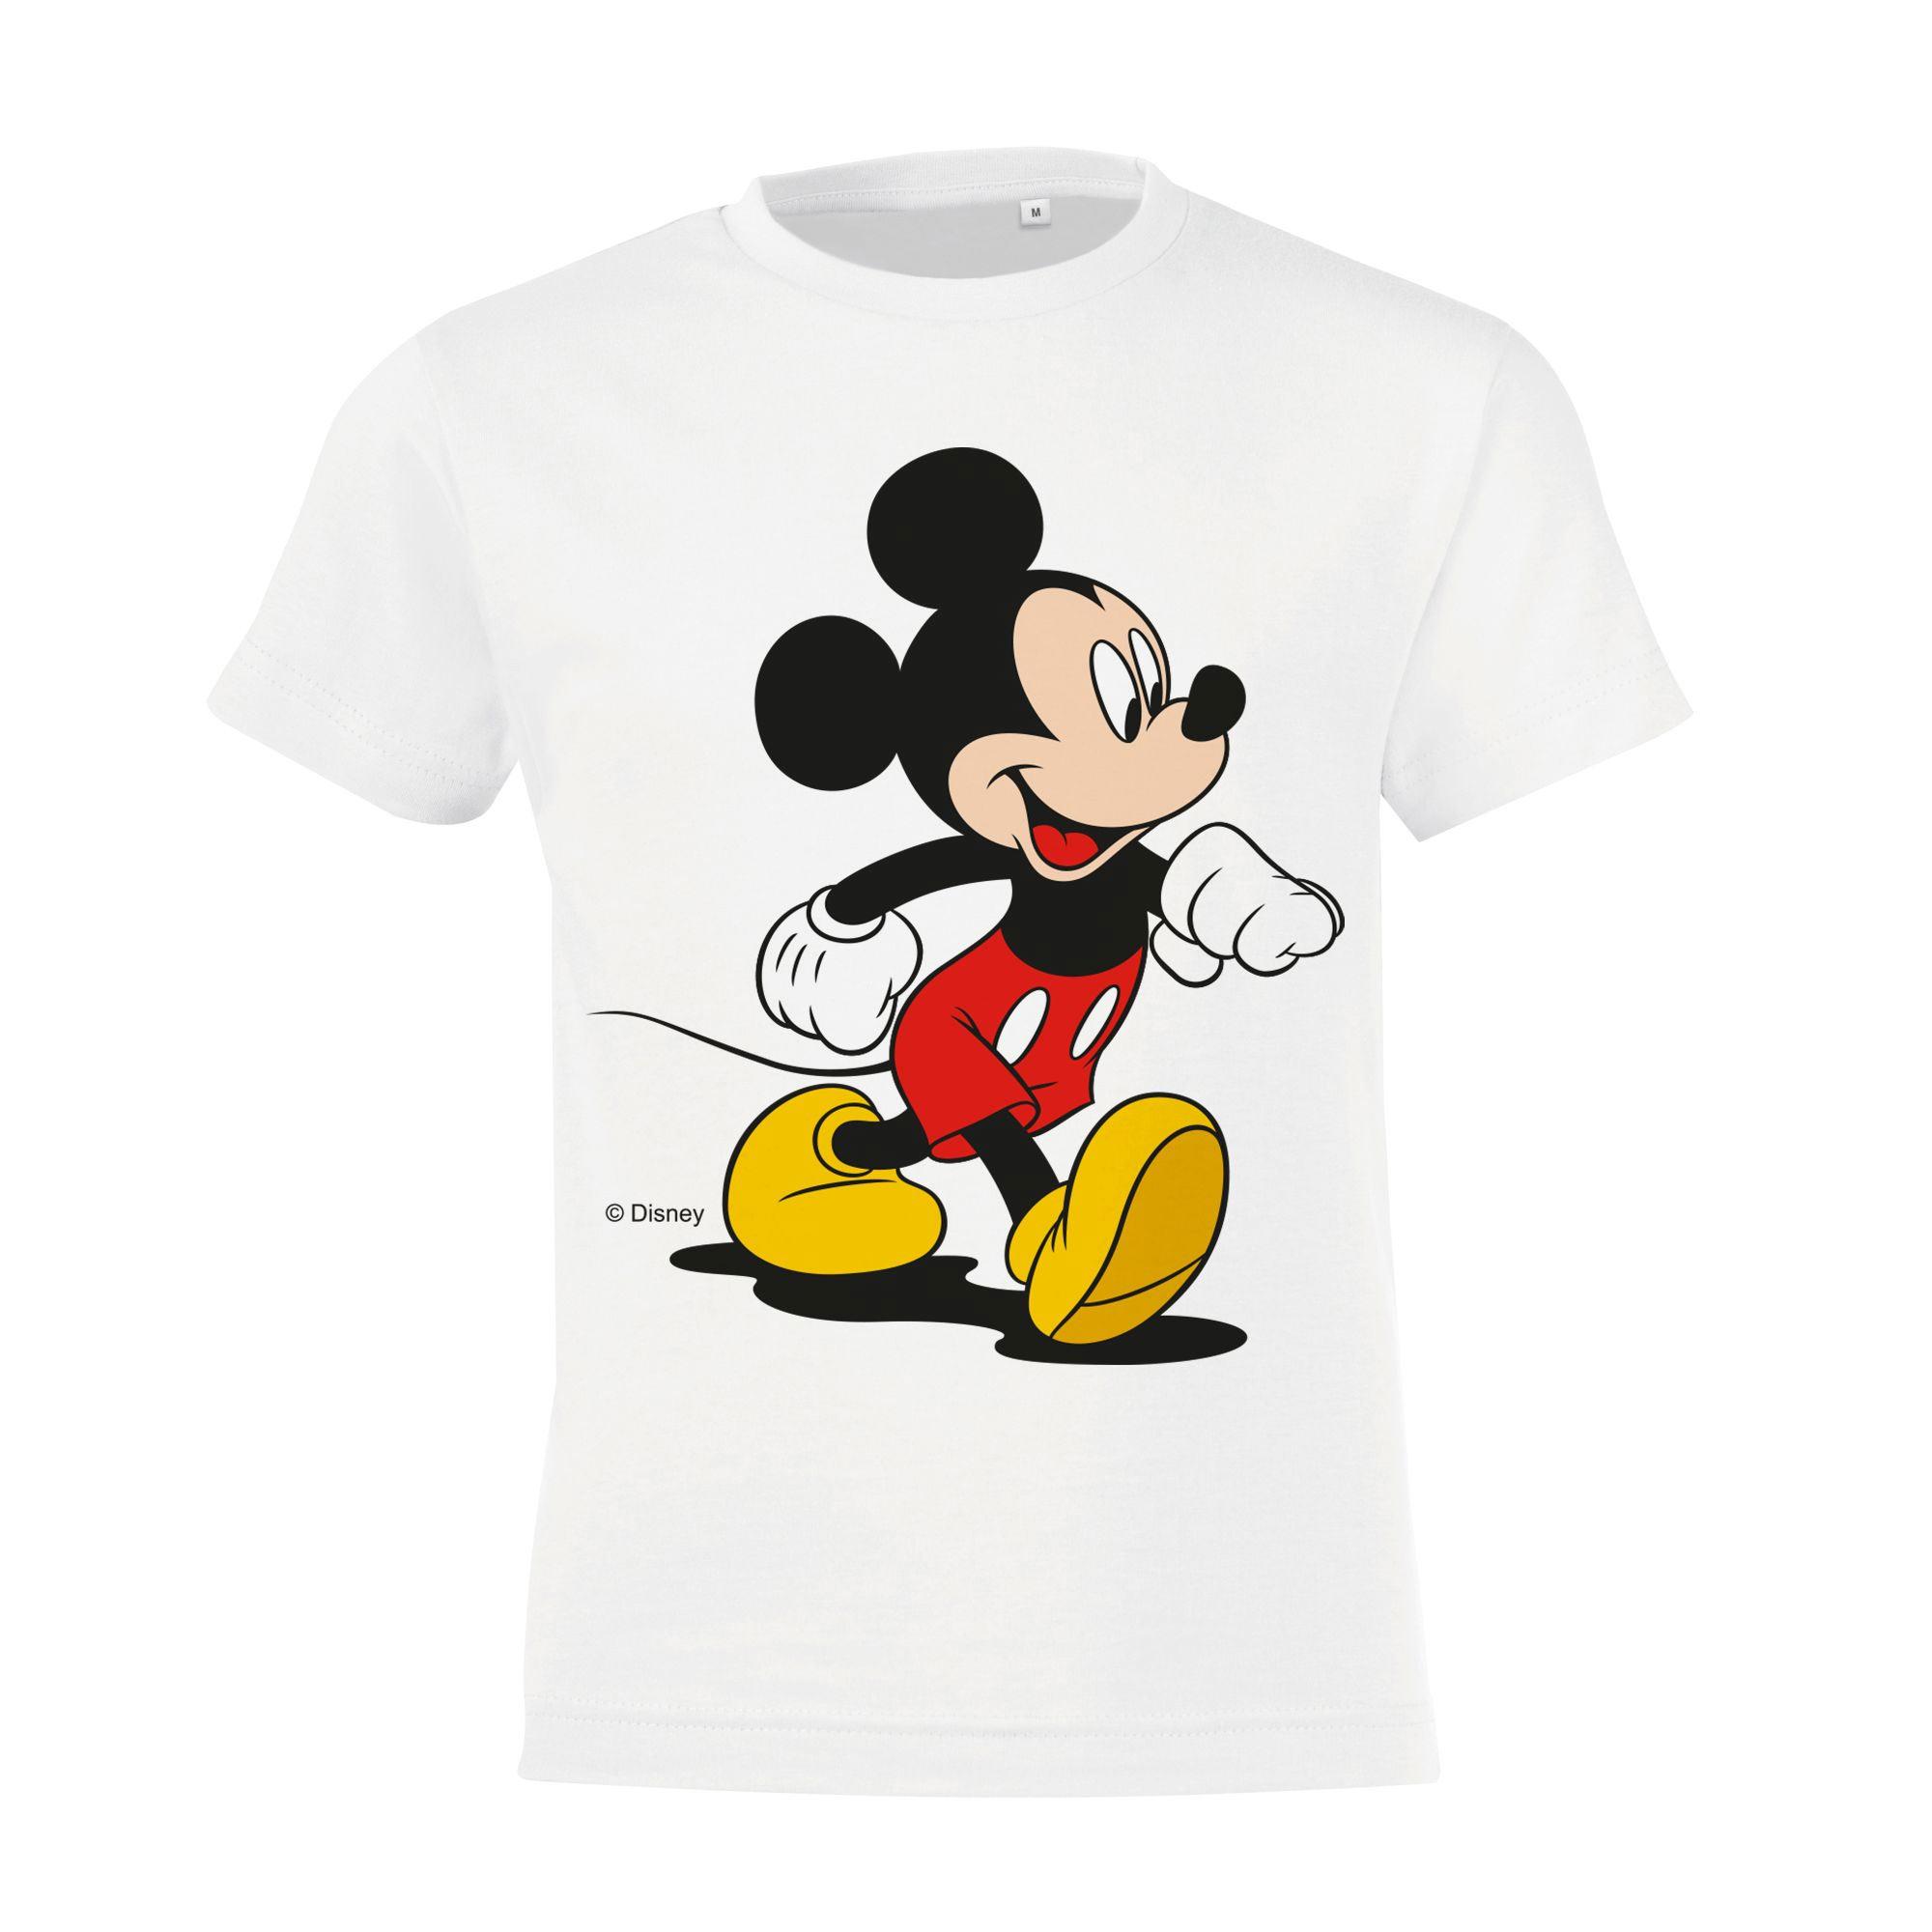 Футболка детская «Микки Маус. Easygoing», белая арт 55532.61